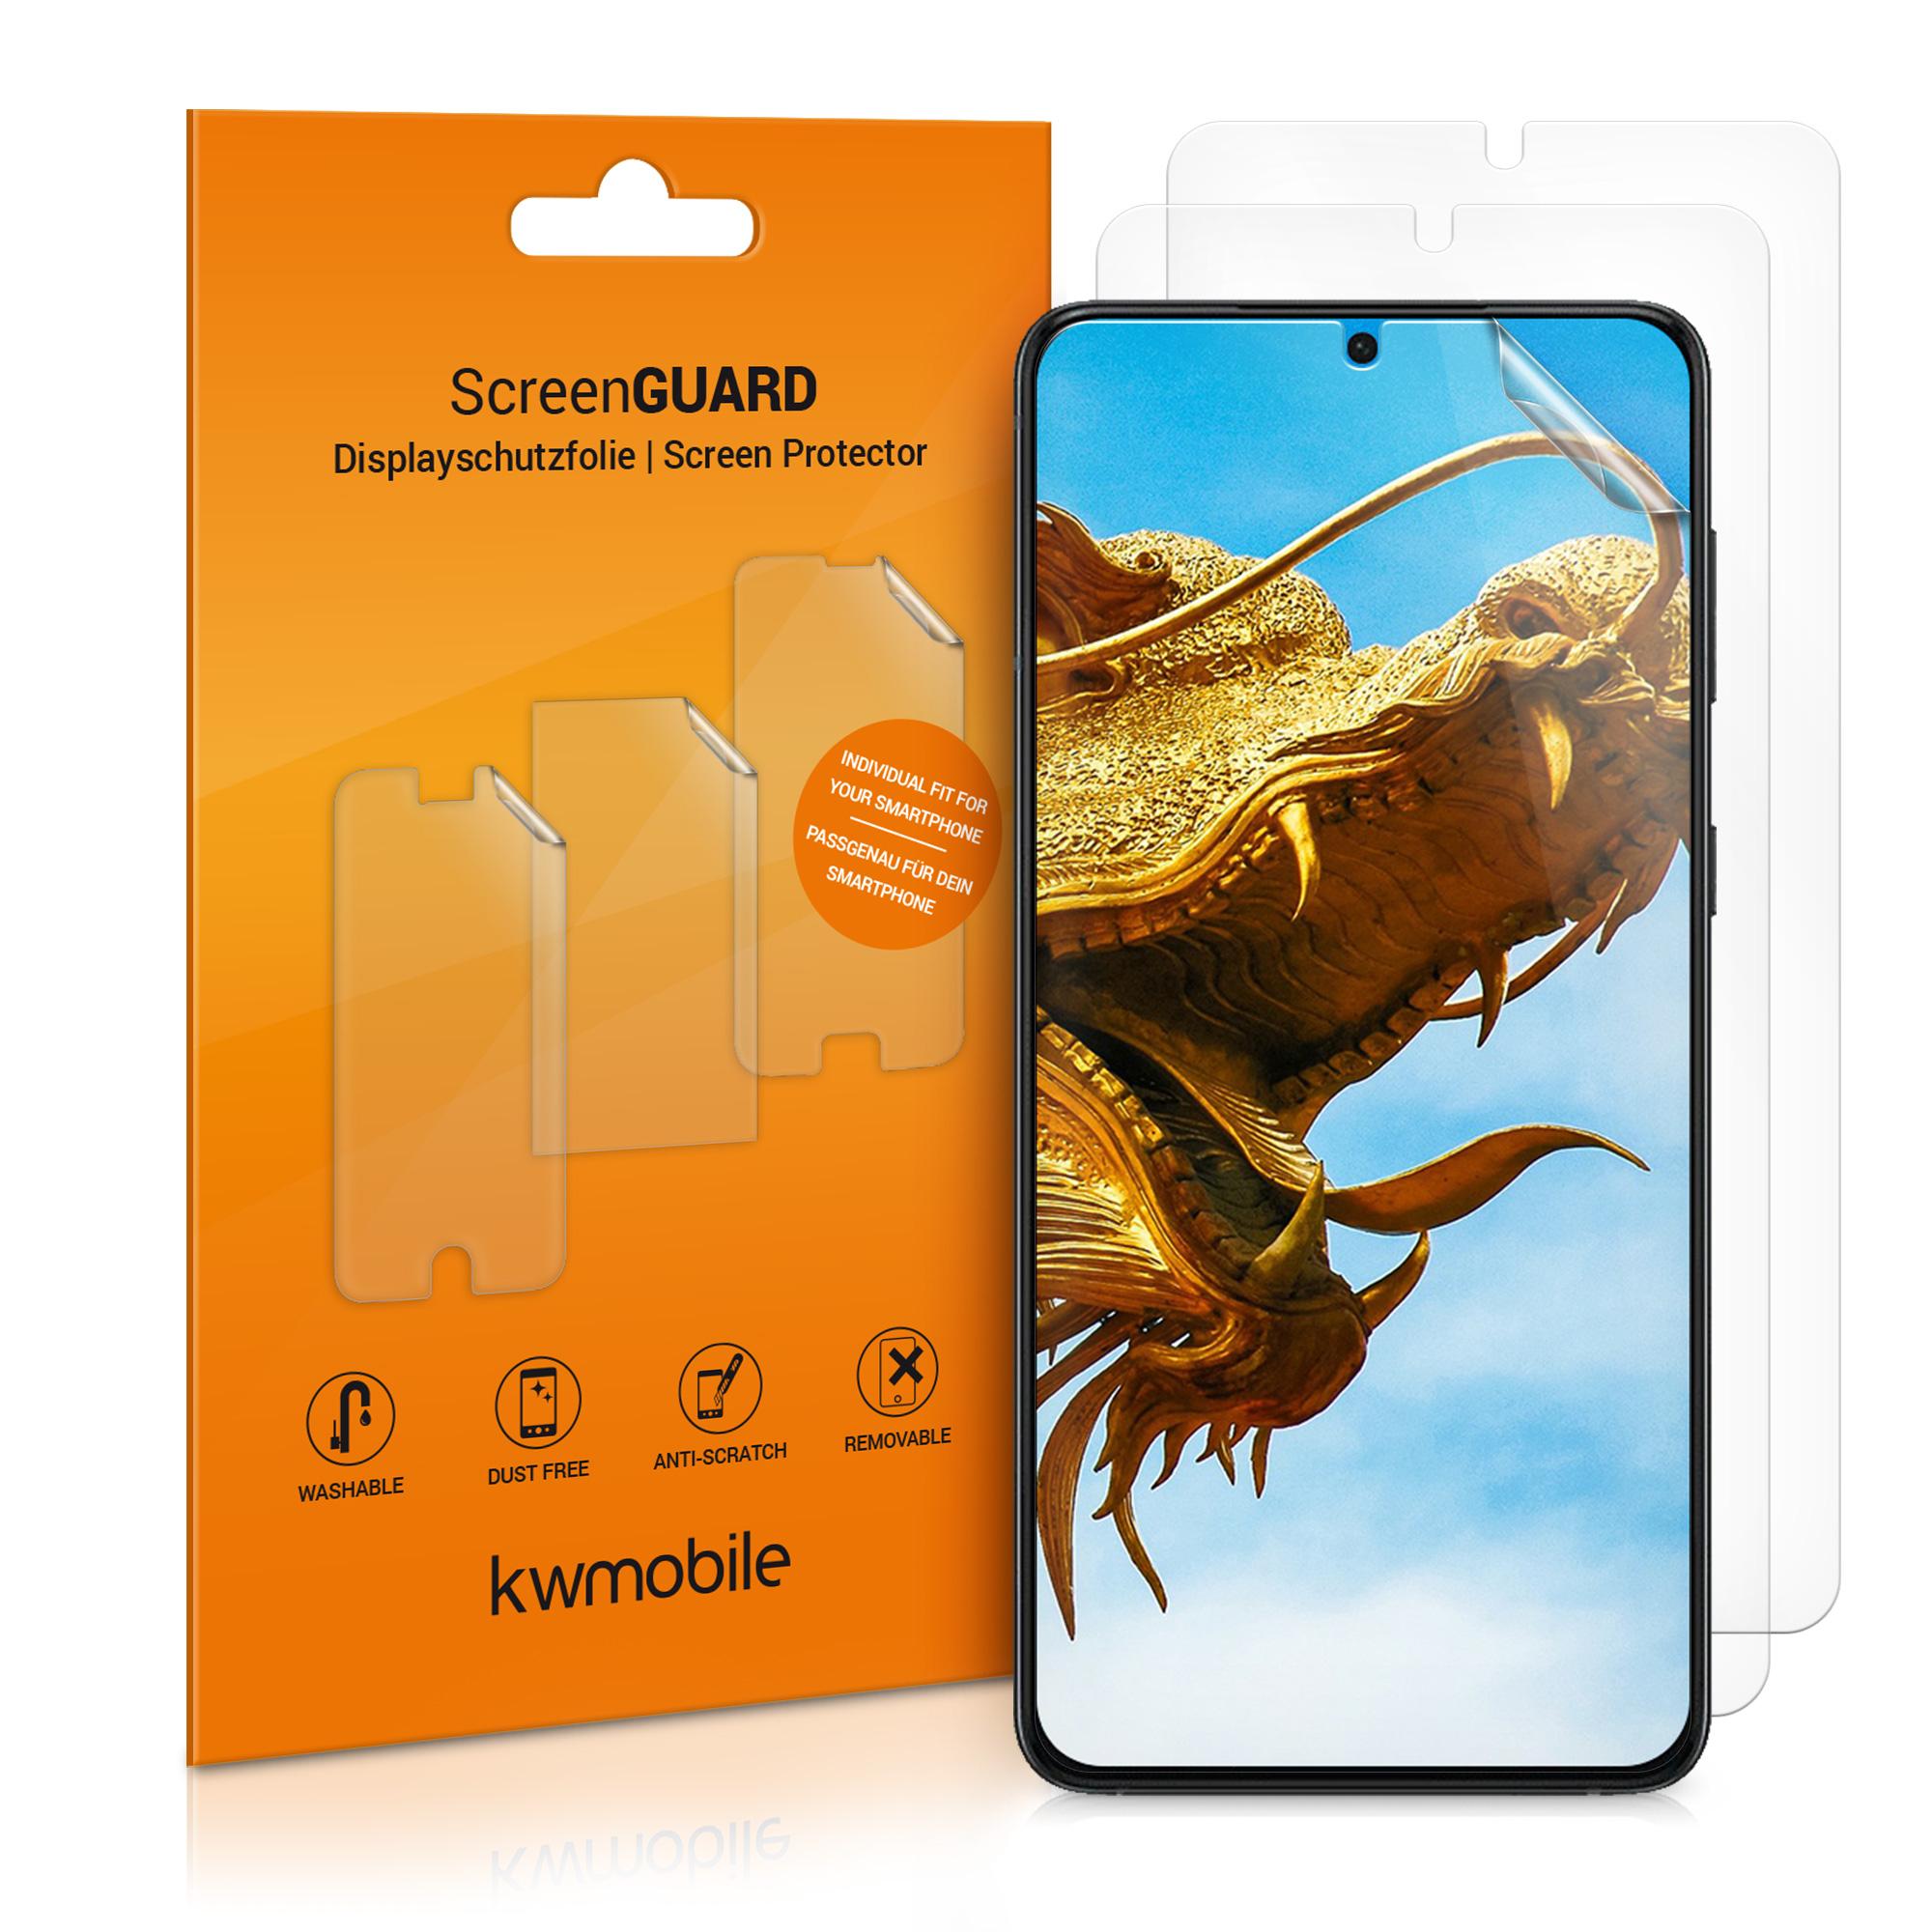 3x folie na display / screenprotector pro Samsung Galaxy S21 Plus